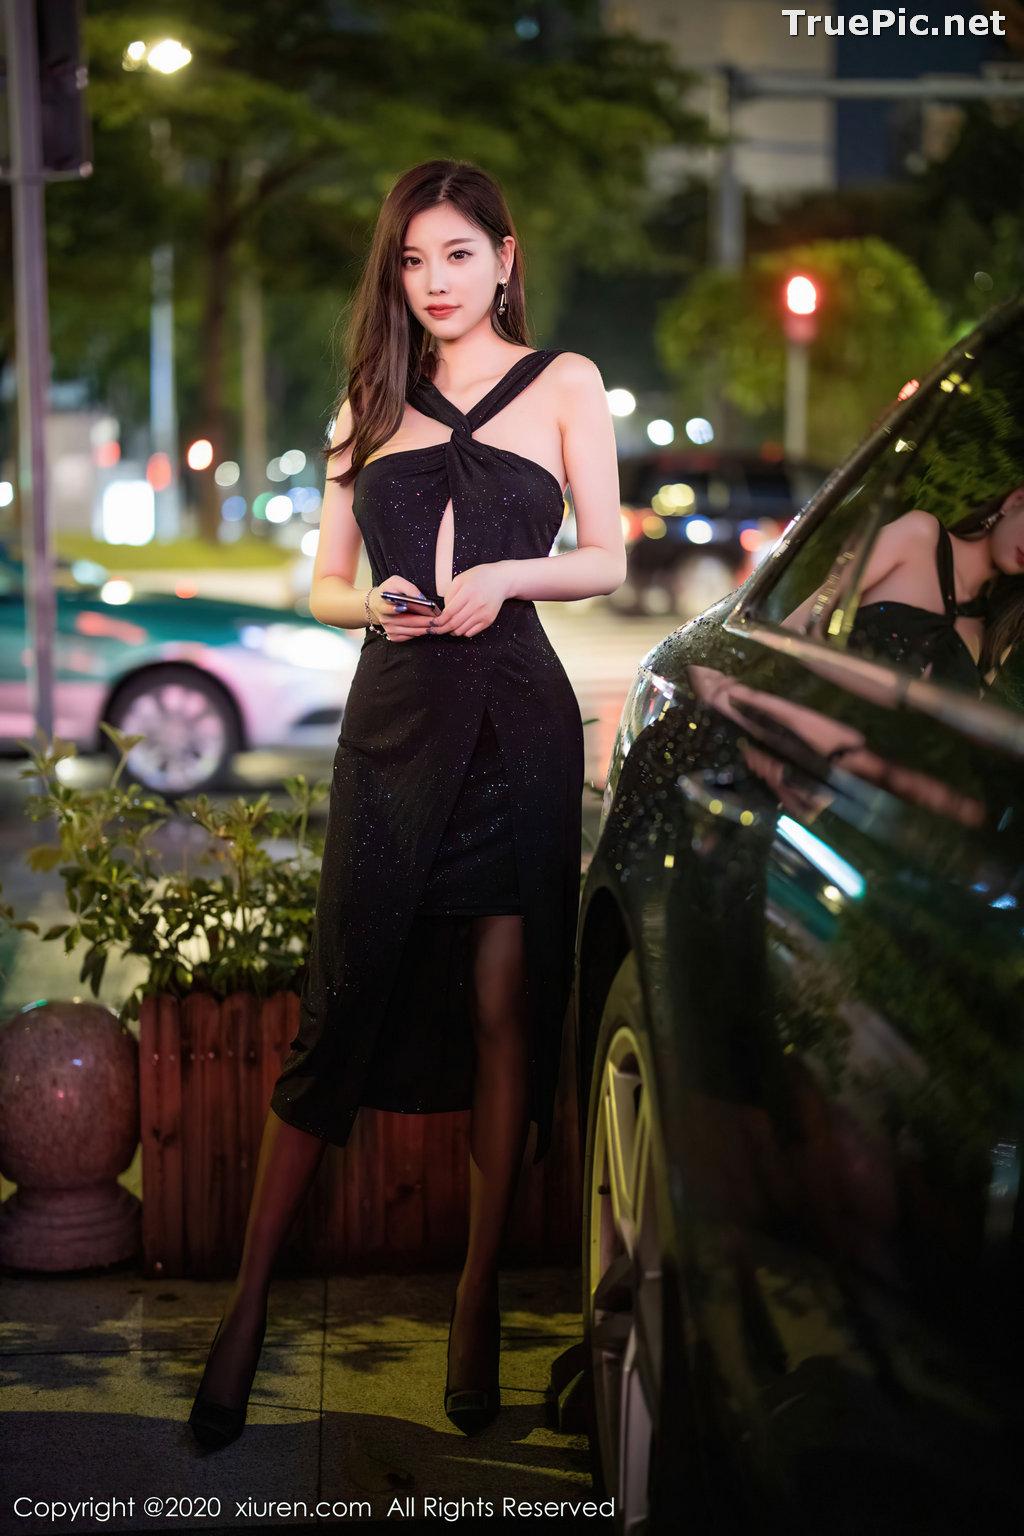 Image XIUREN No.2616 - Chinese Model - Yang Chen Chen (杨晨晨sugar) - Sexy Dark Lady - TruePic.net - Picture-1